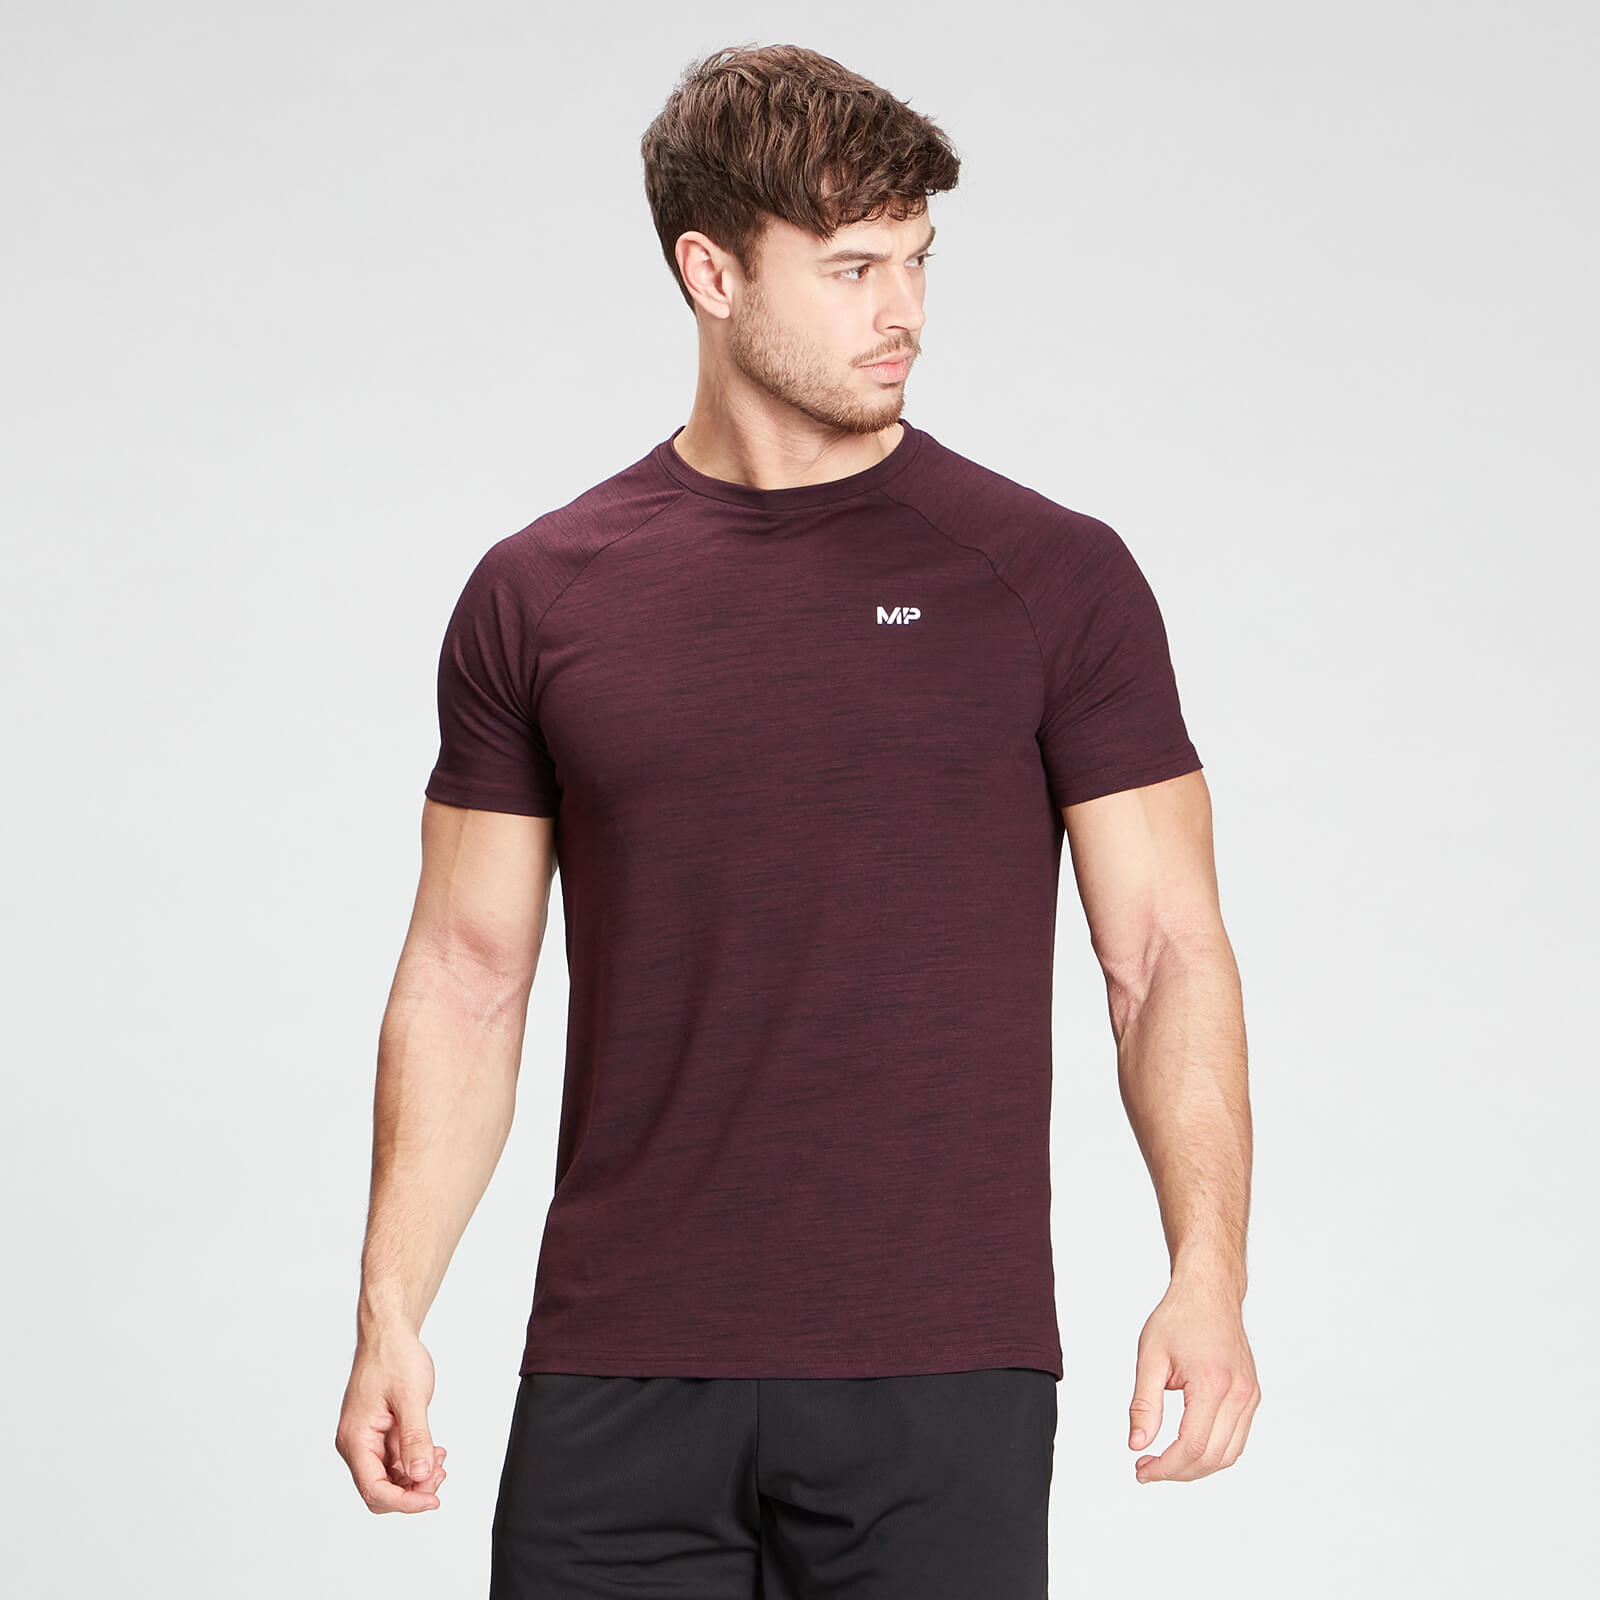 Купить MP Men's Performance Short Sleeve T-Shirt - Port Marl - XXL, Myprotein International